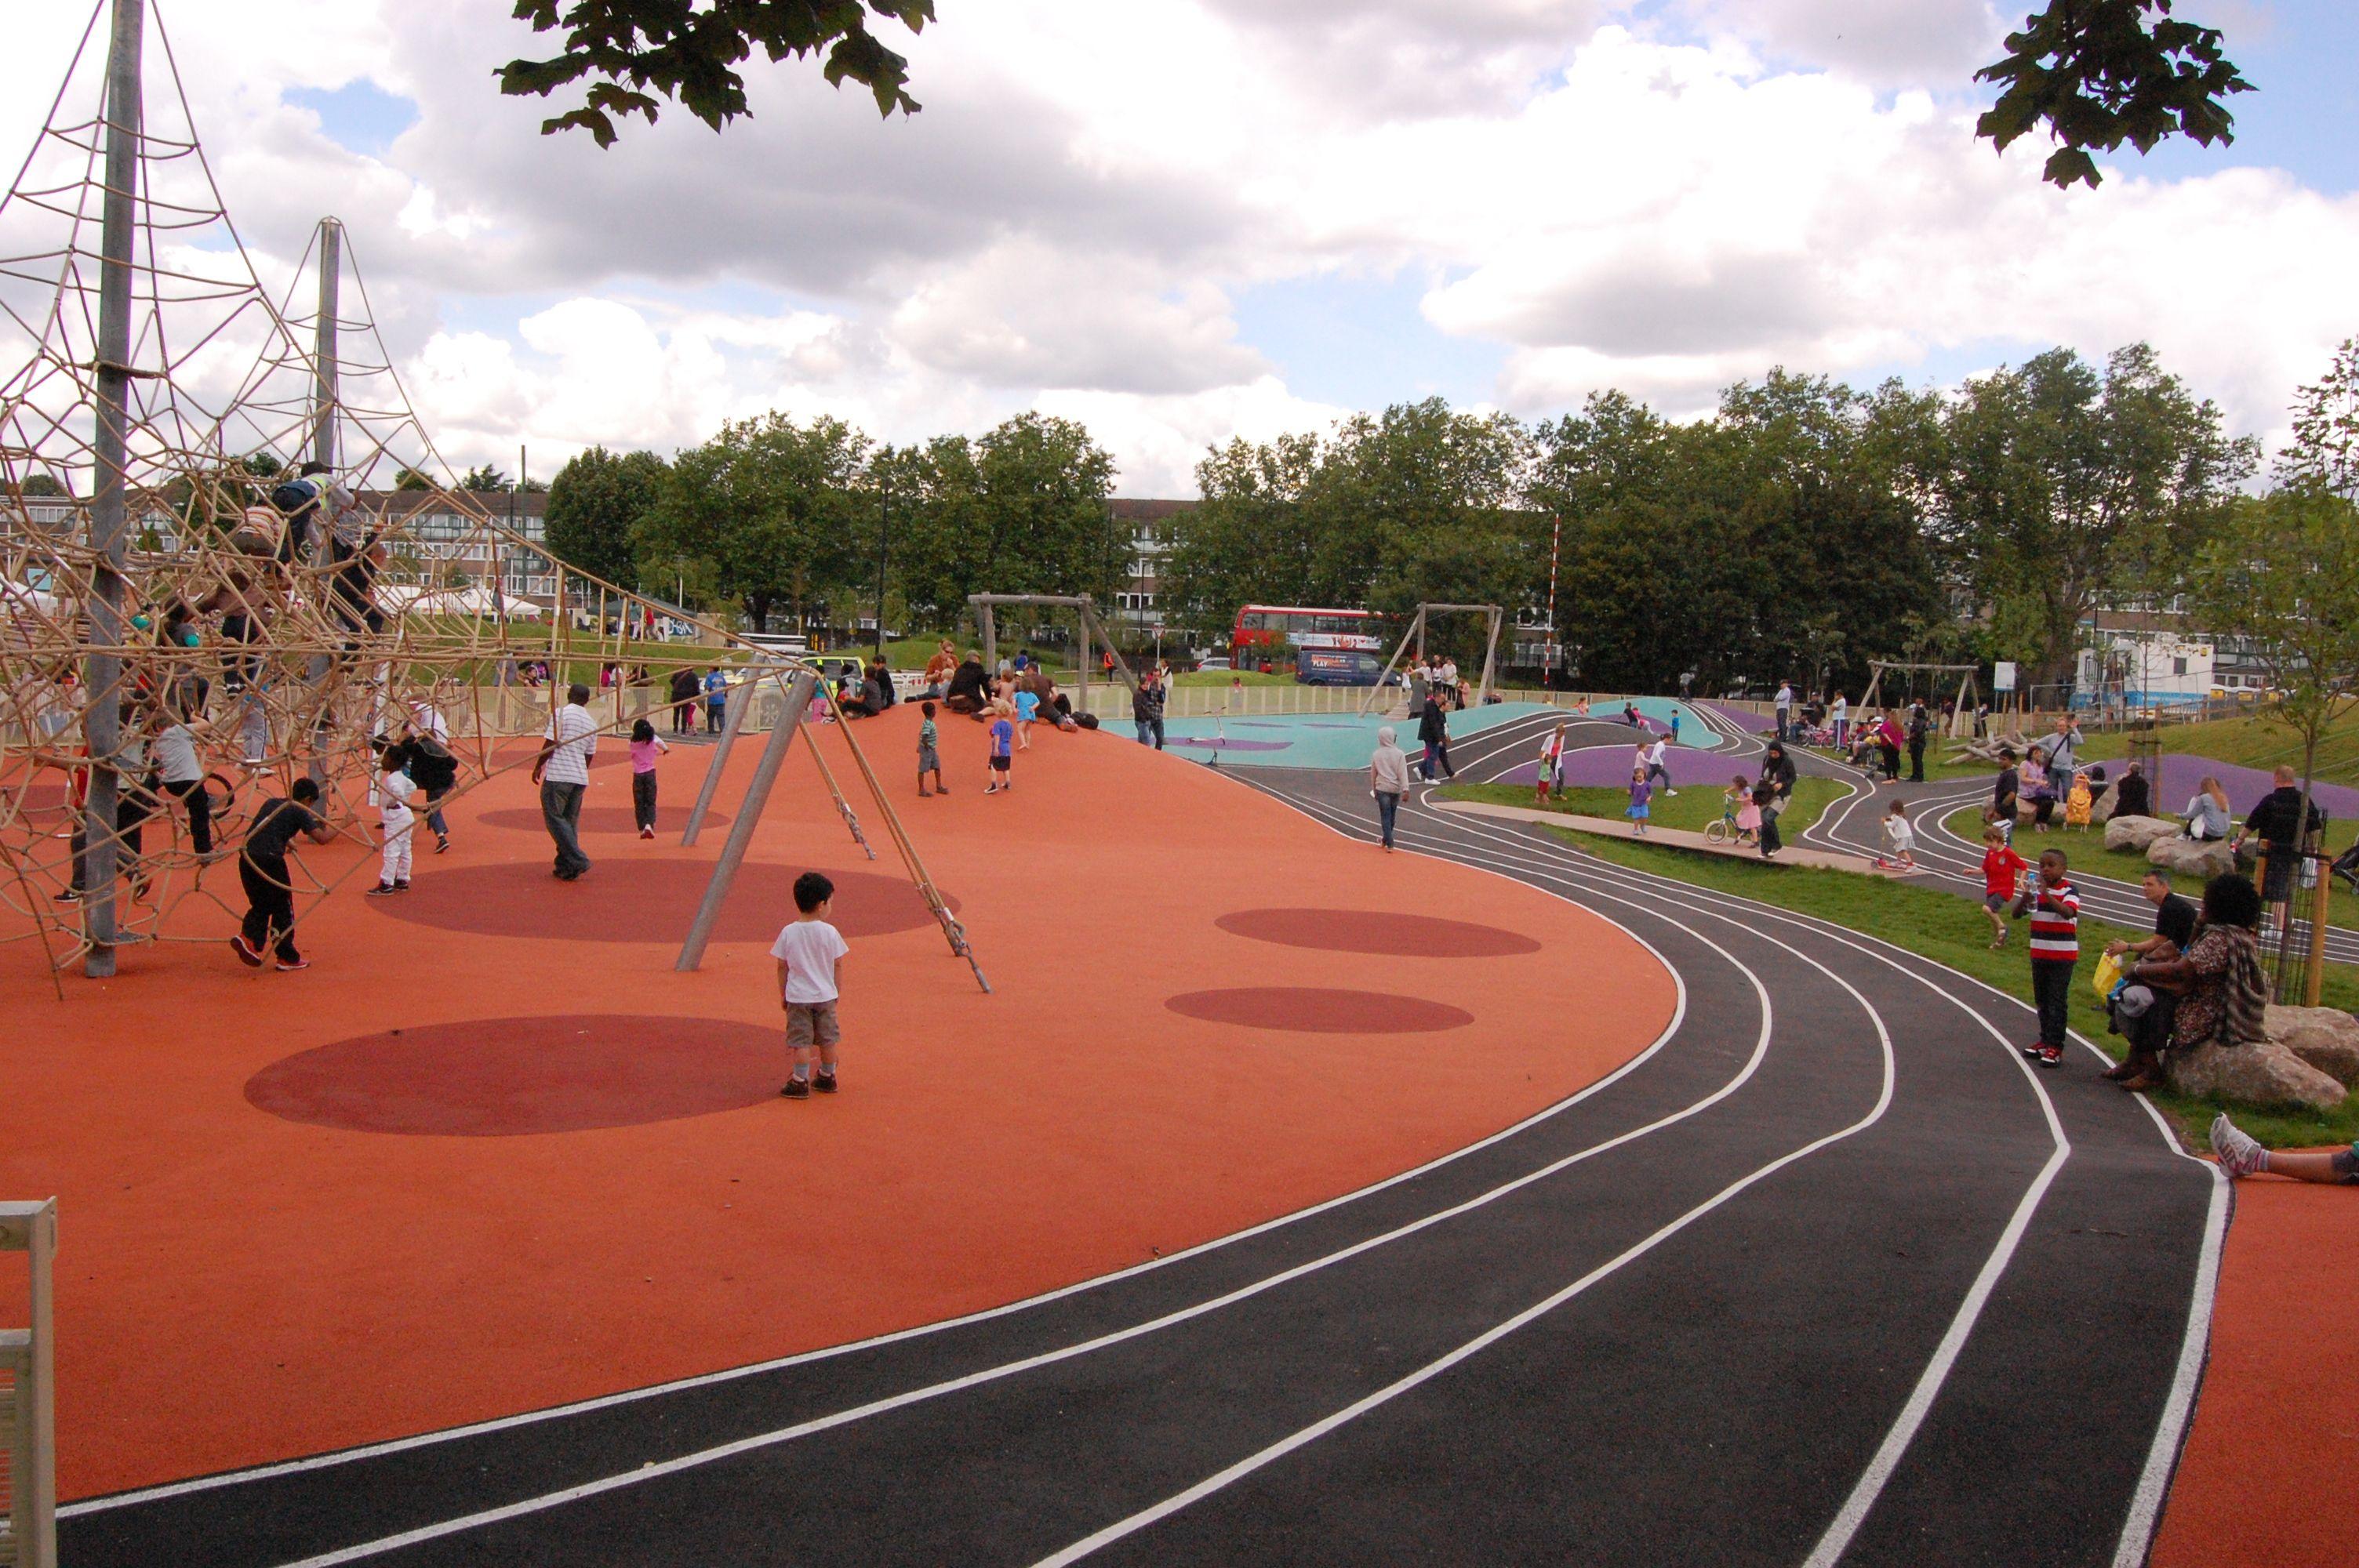 Burgess Park Over 5s Play Area Walworth London